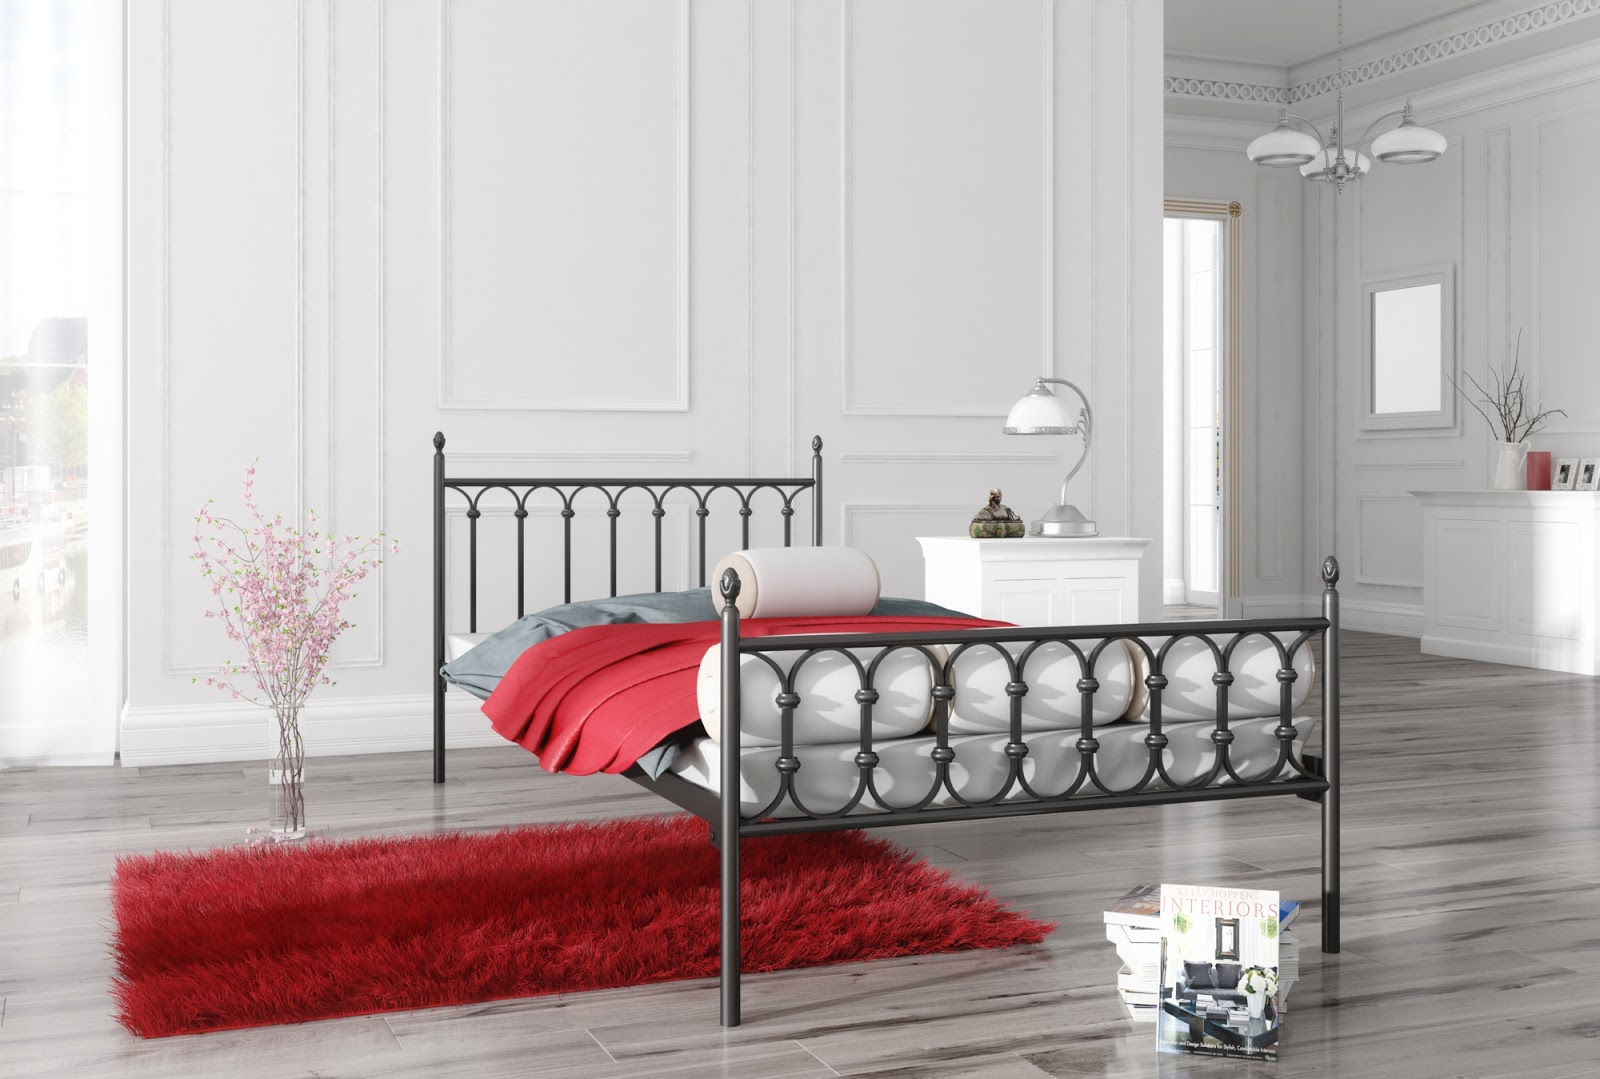 Łóżko metalowe wzór 8